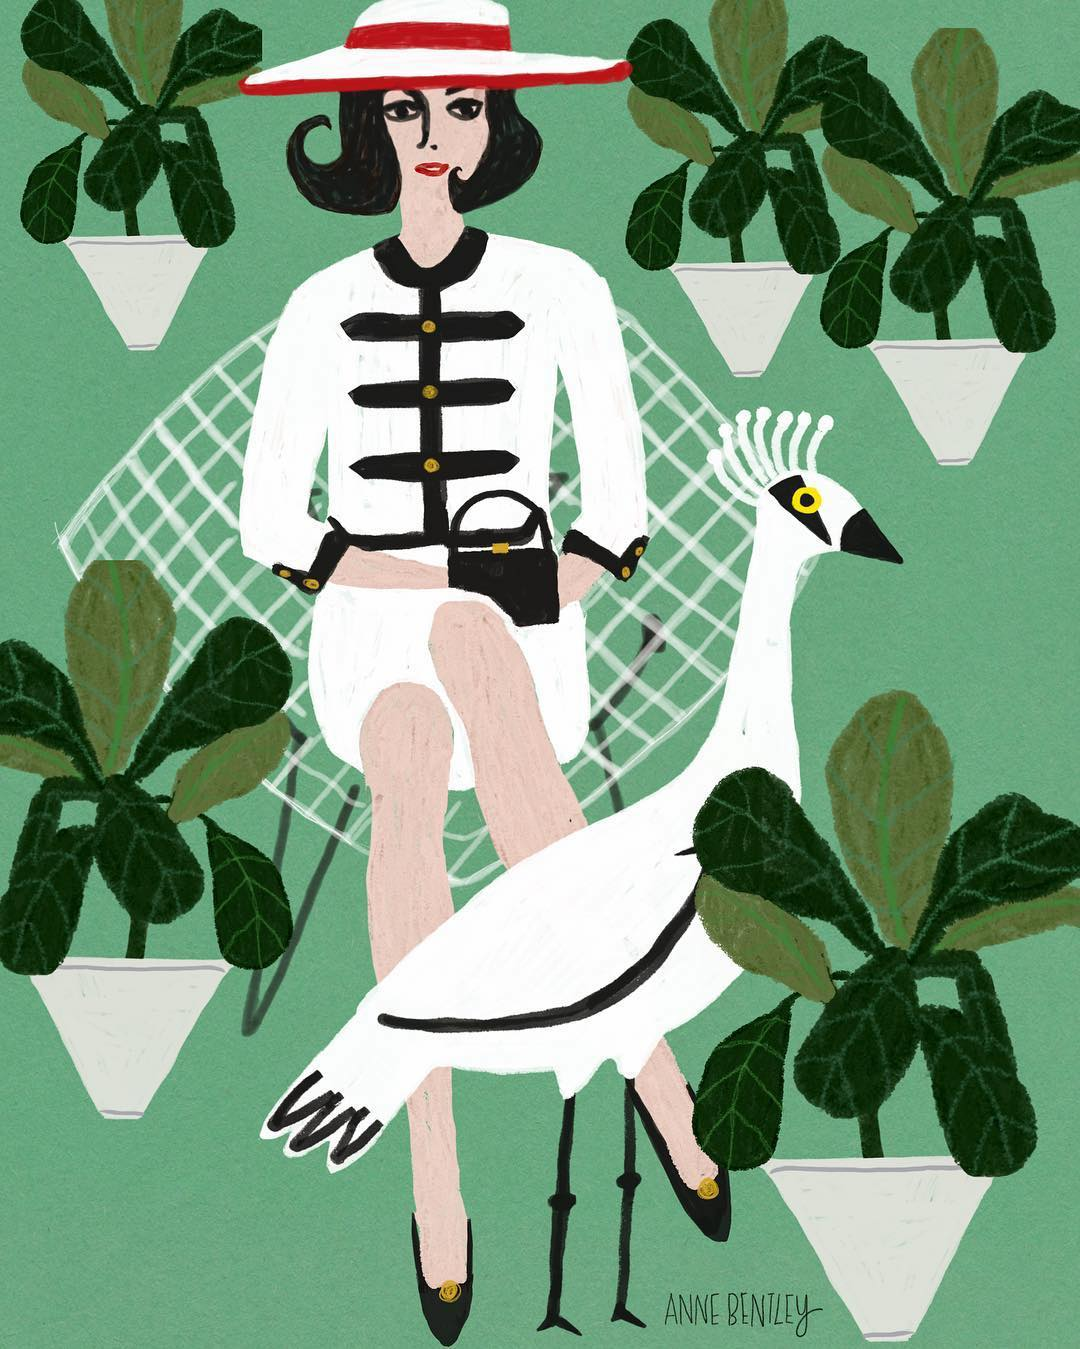 Illustration by Anne M. Bentley